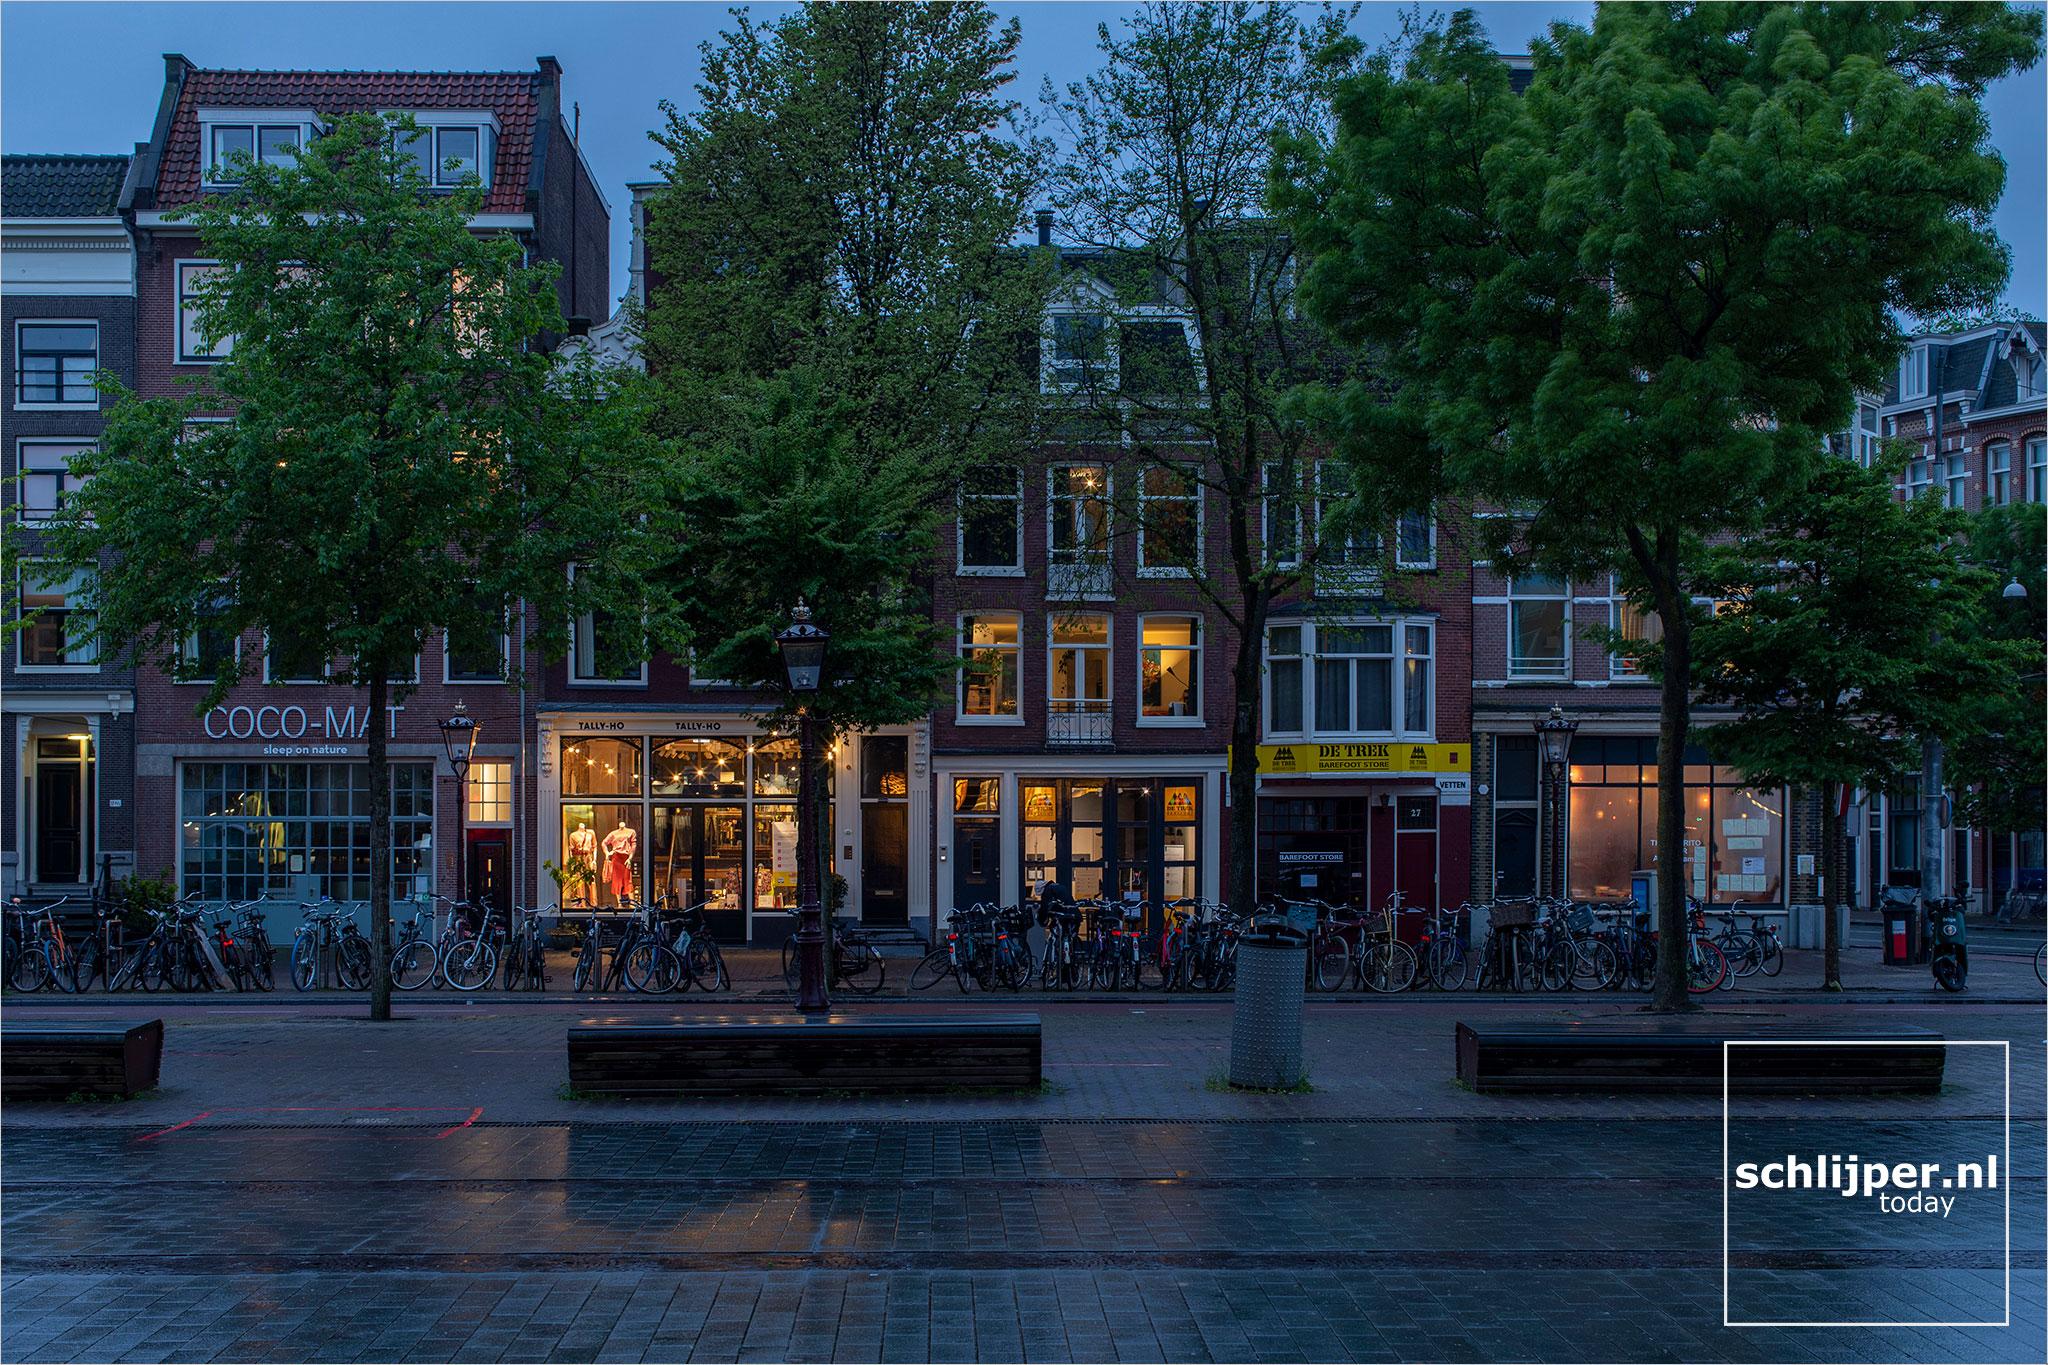 Nederland, Amsterdam, 28 april 2020